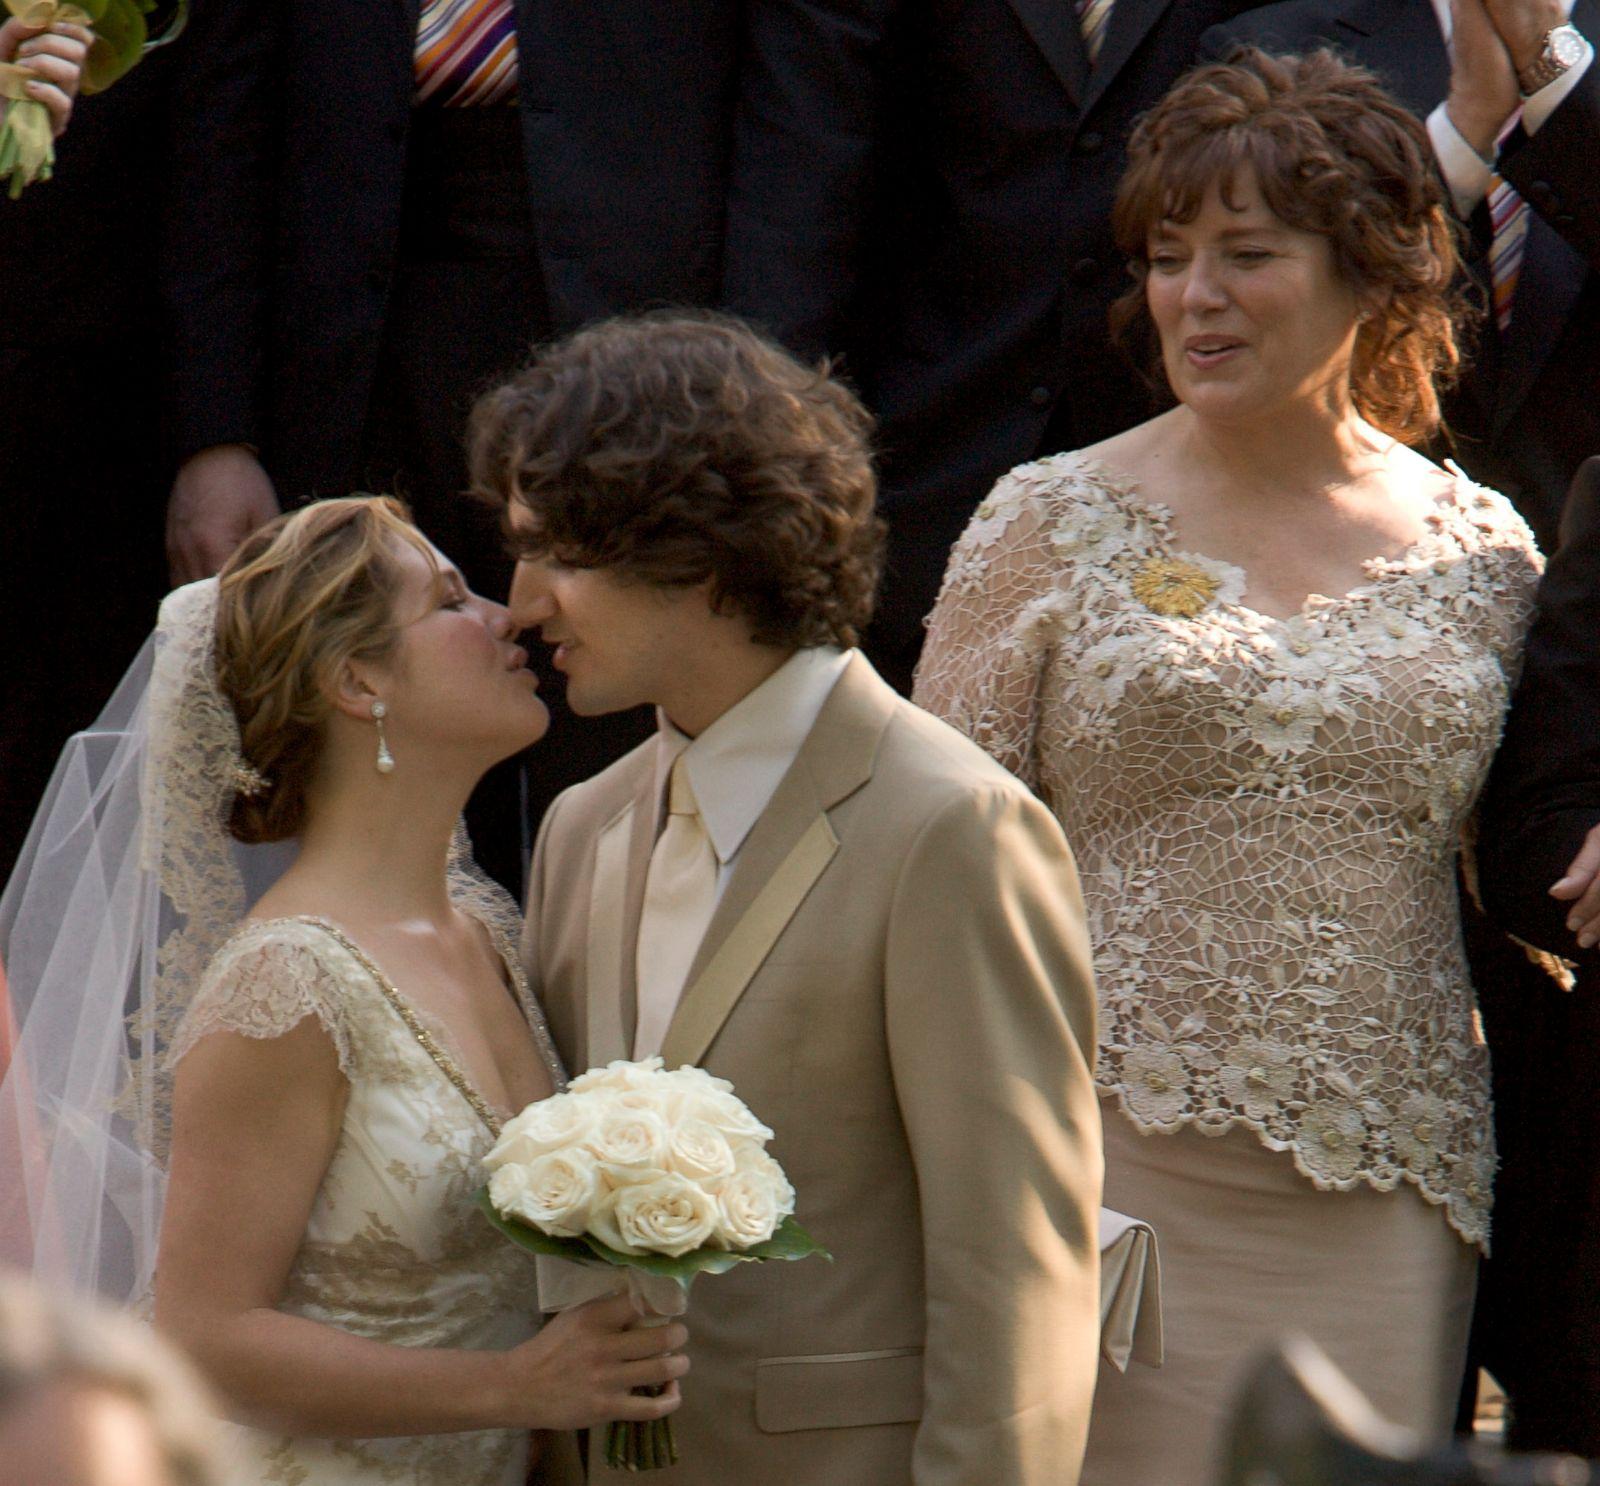 Justin poling wedding